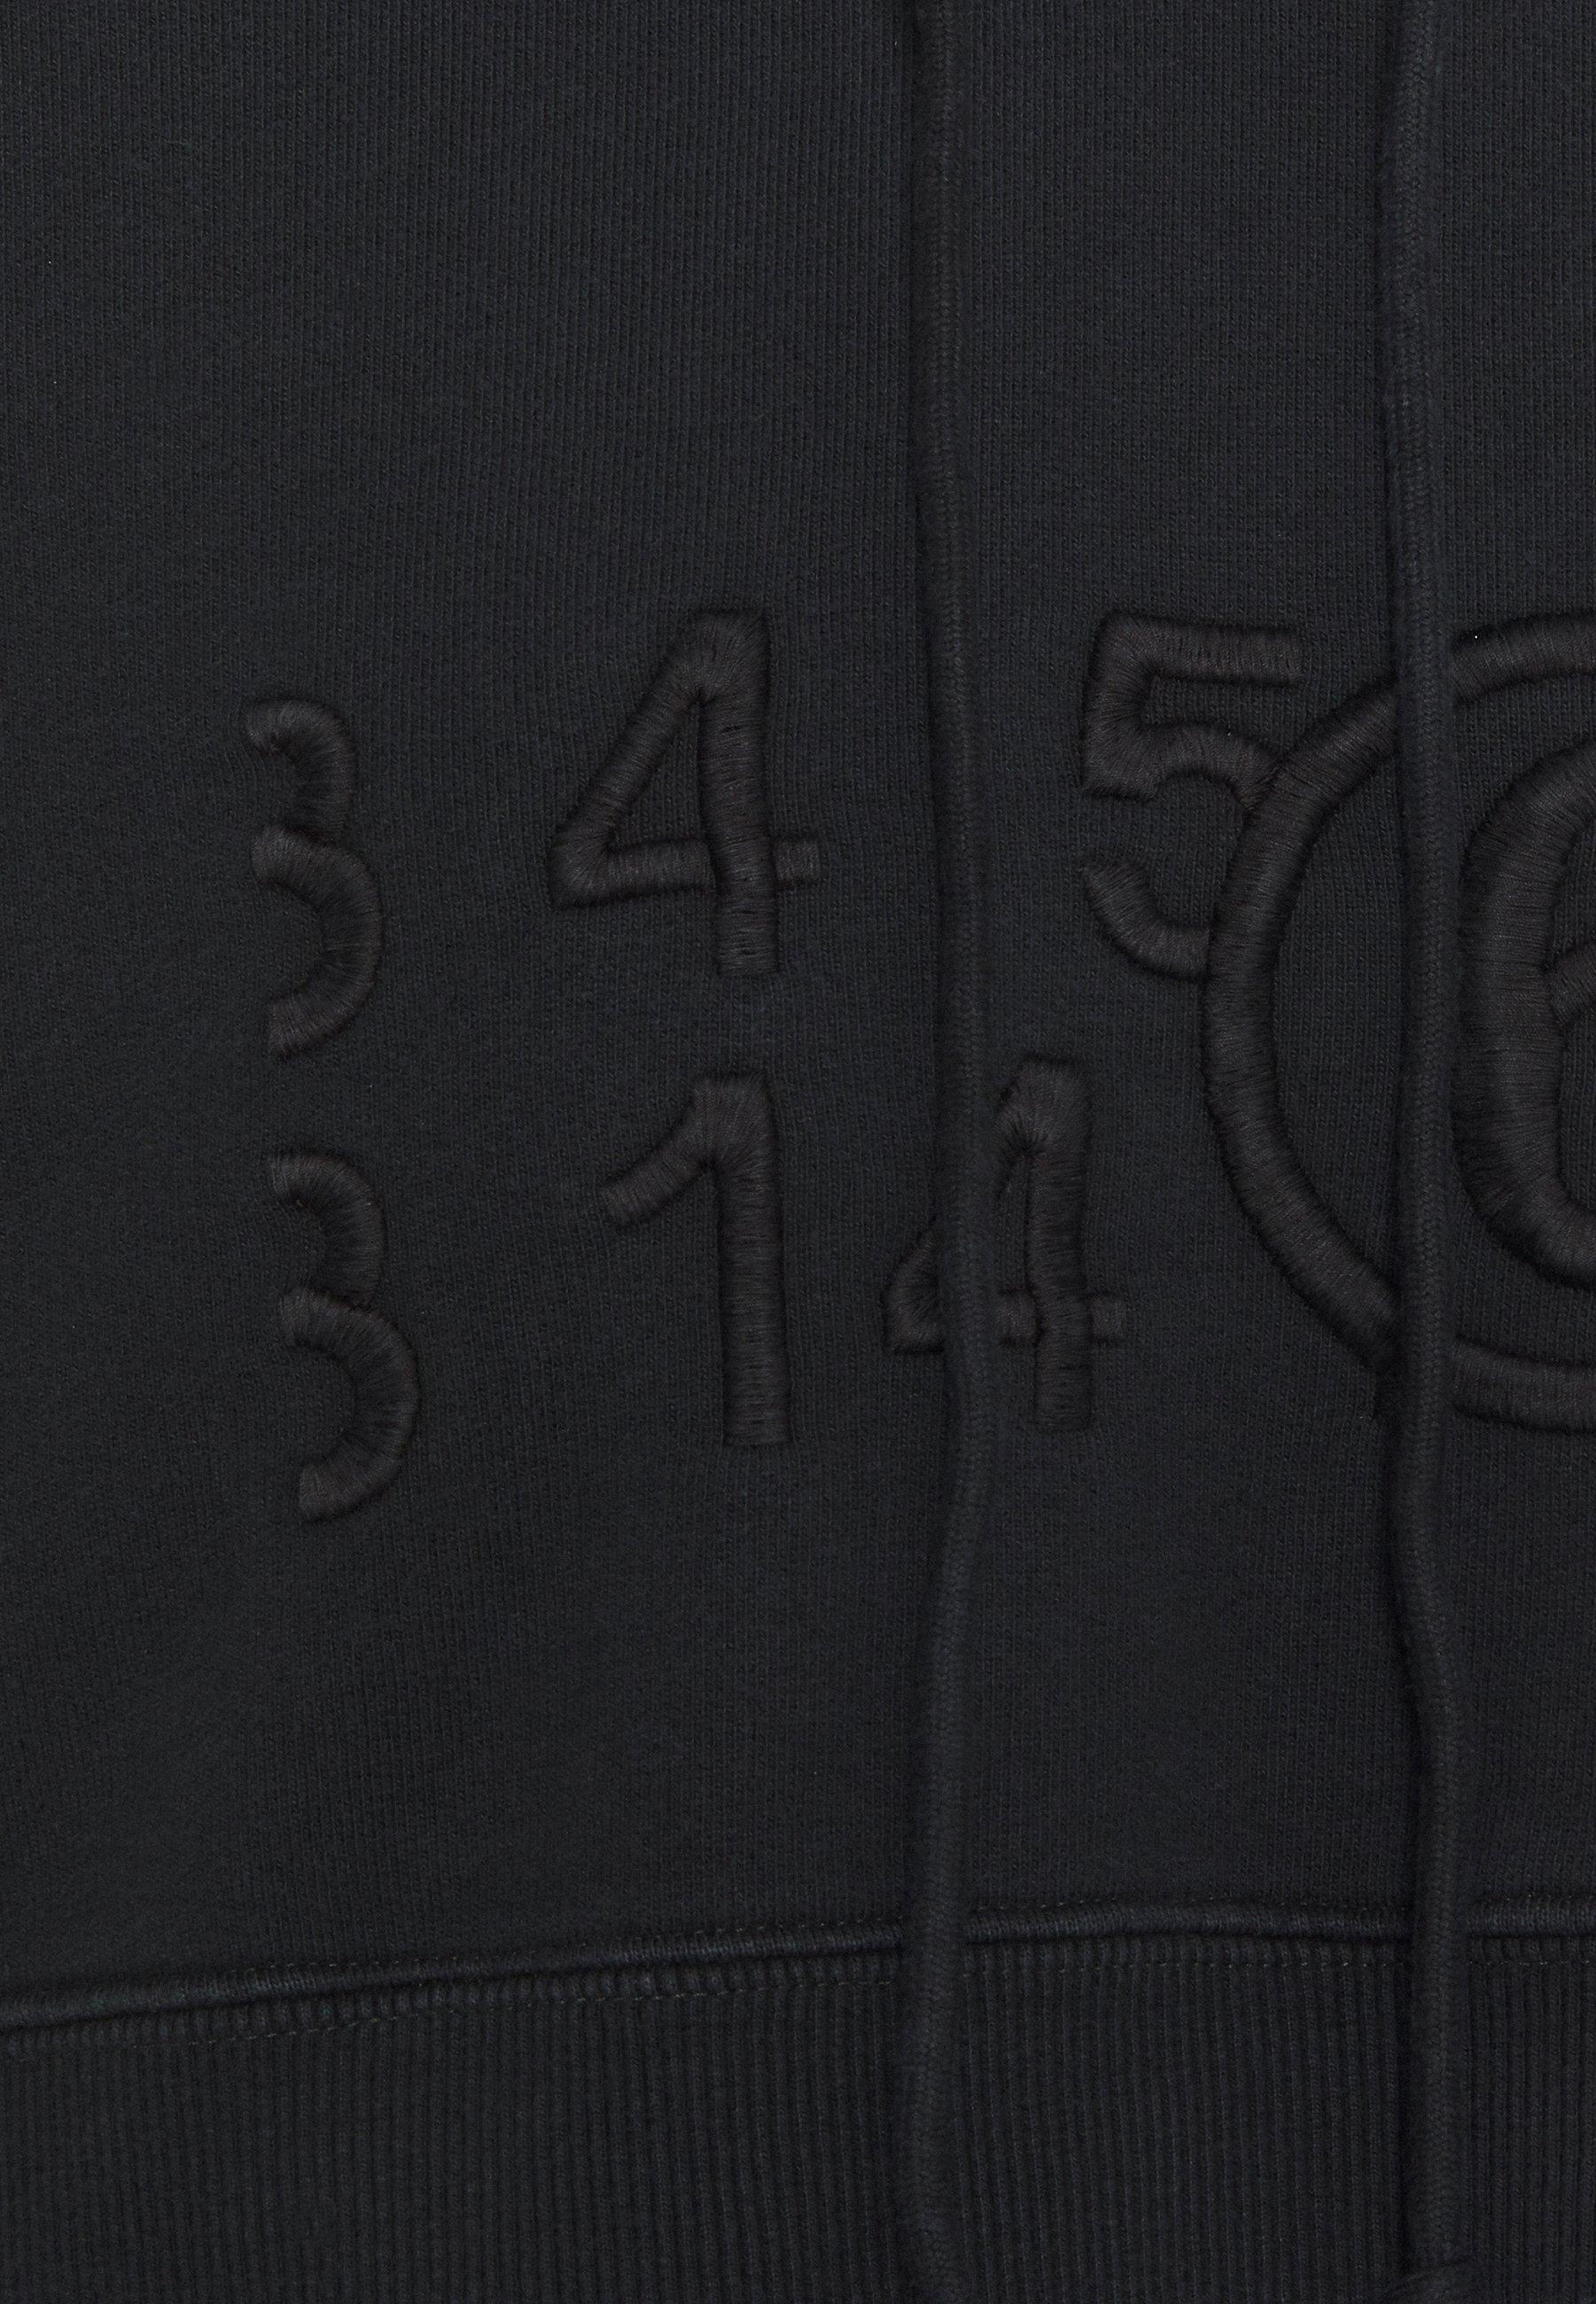 MM6 Maison Margiela Hoodie - black - Dames jas Actueel